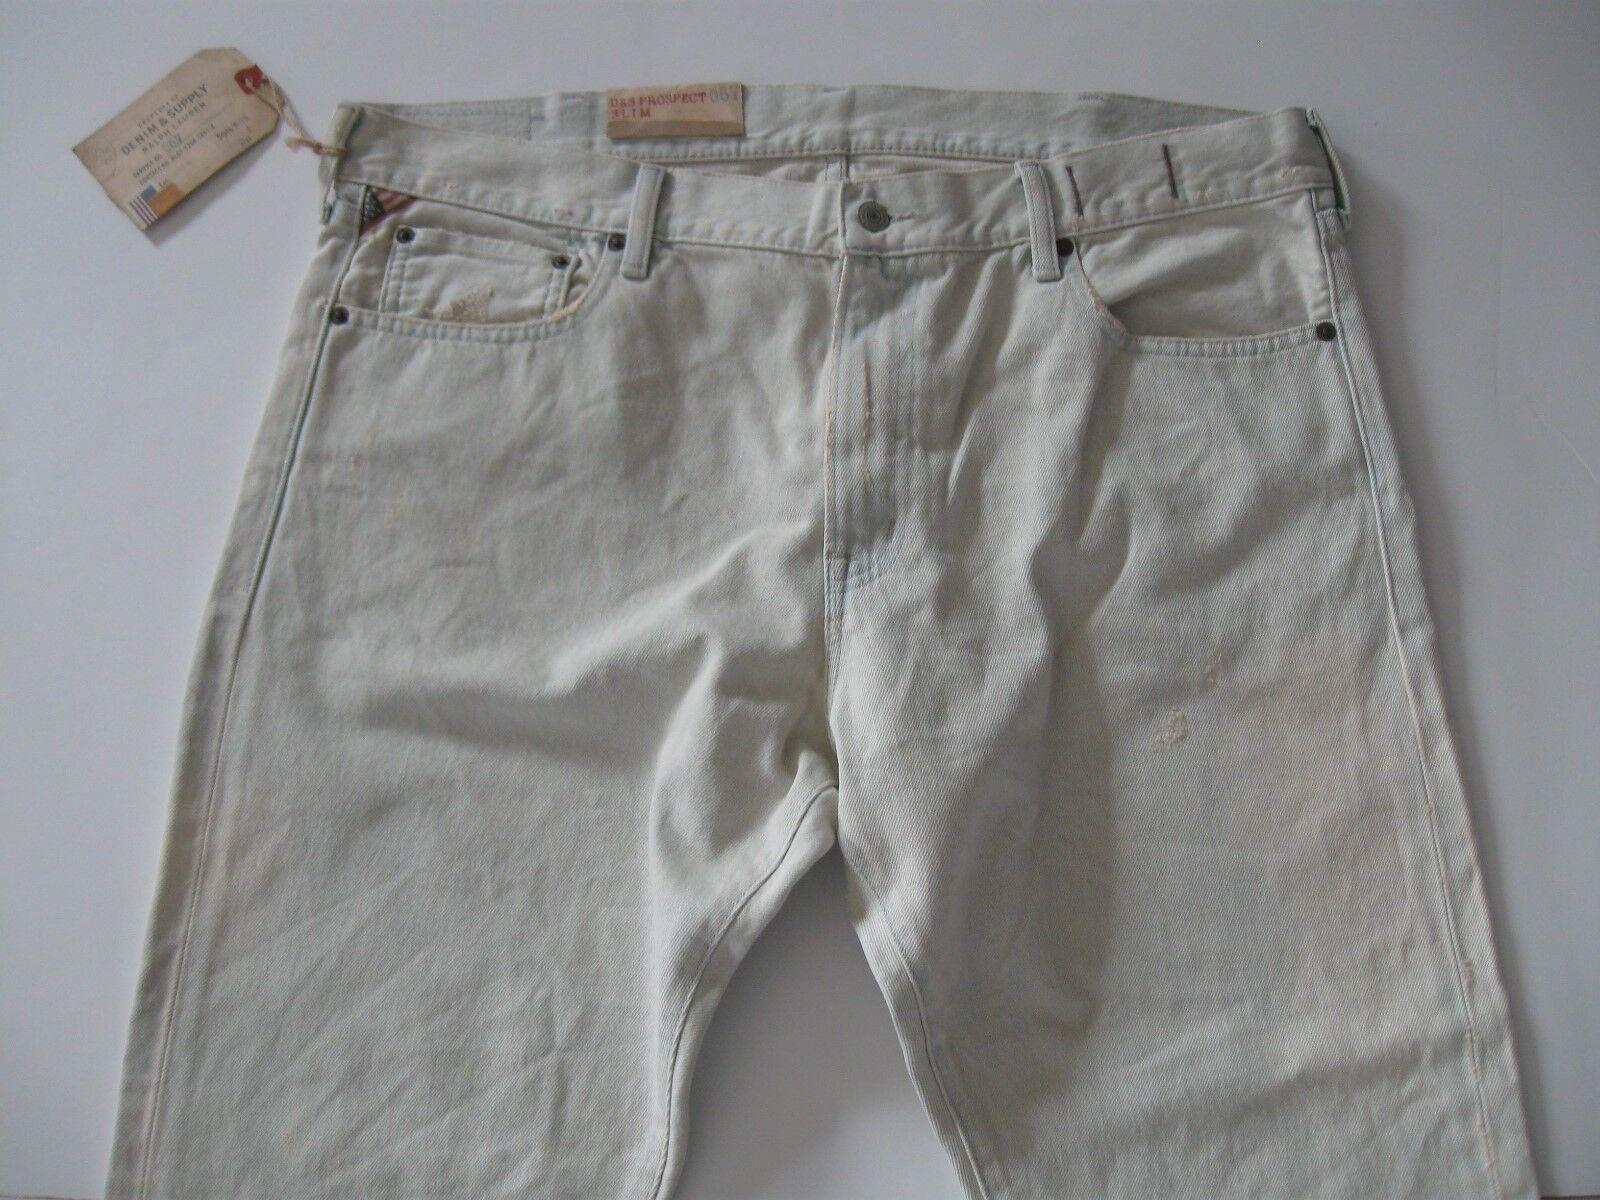 DENIM & SUPPLY RALPH LAUREN Men's Slim-Fit Very Faded bluee Wash Jeans 38x32